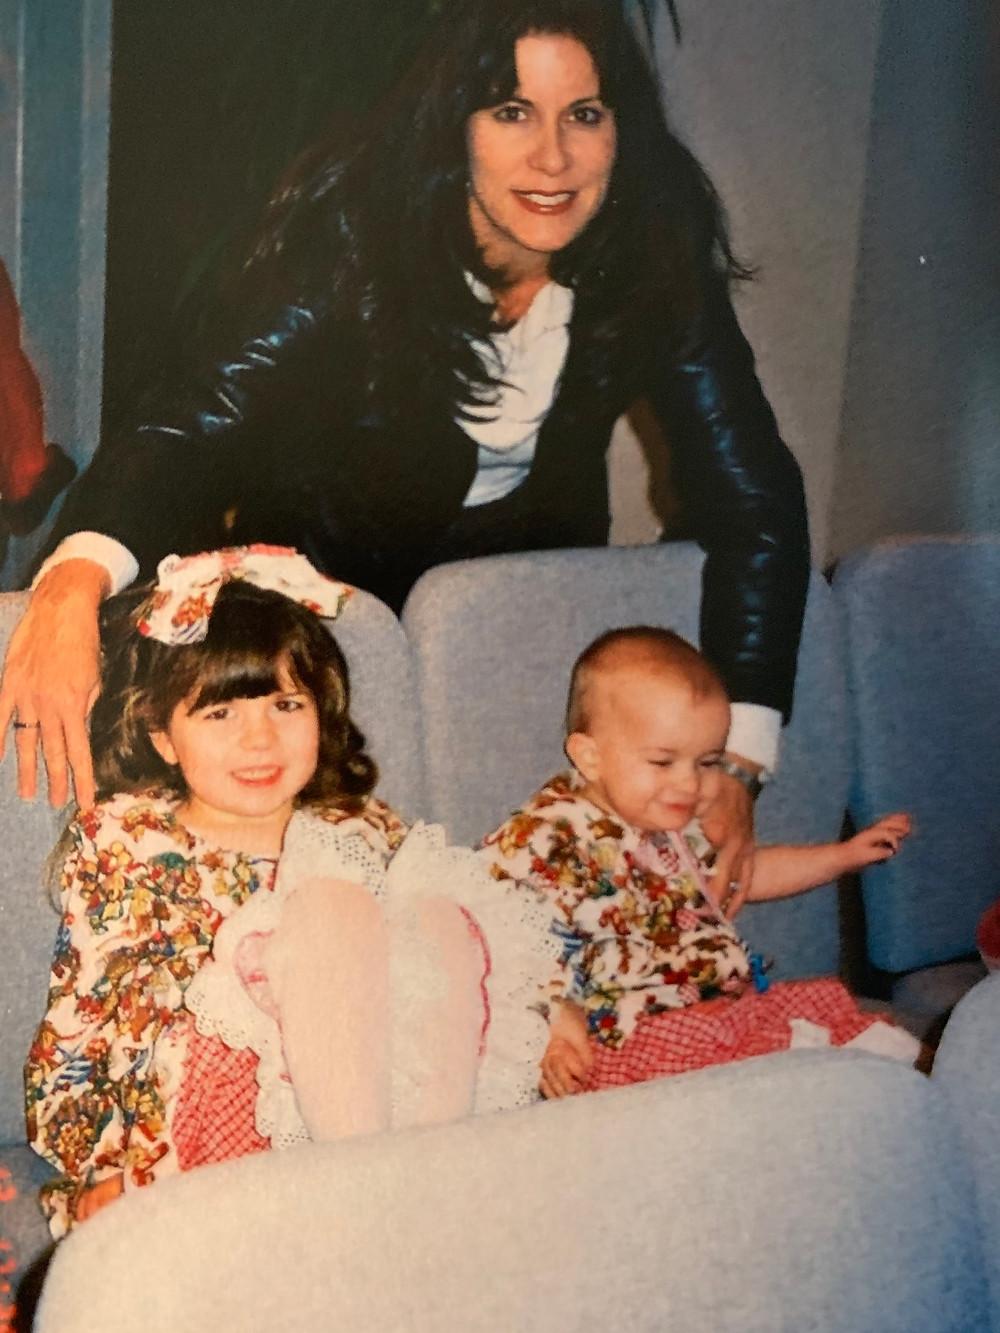 Christmas 2004 with Rachel and Gracie